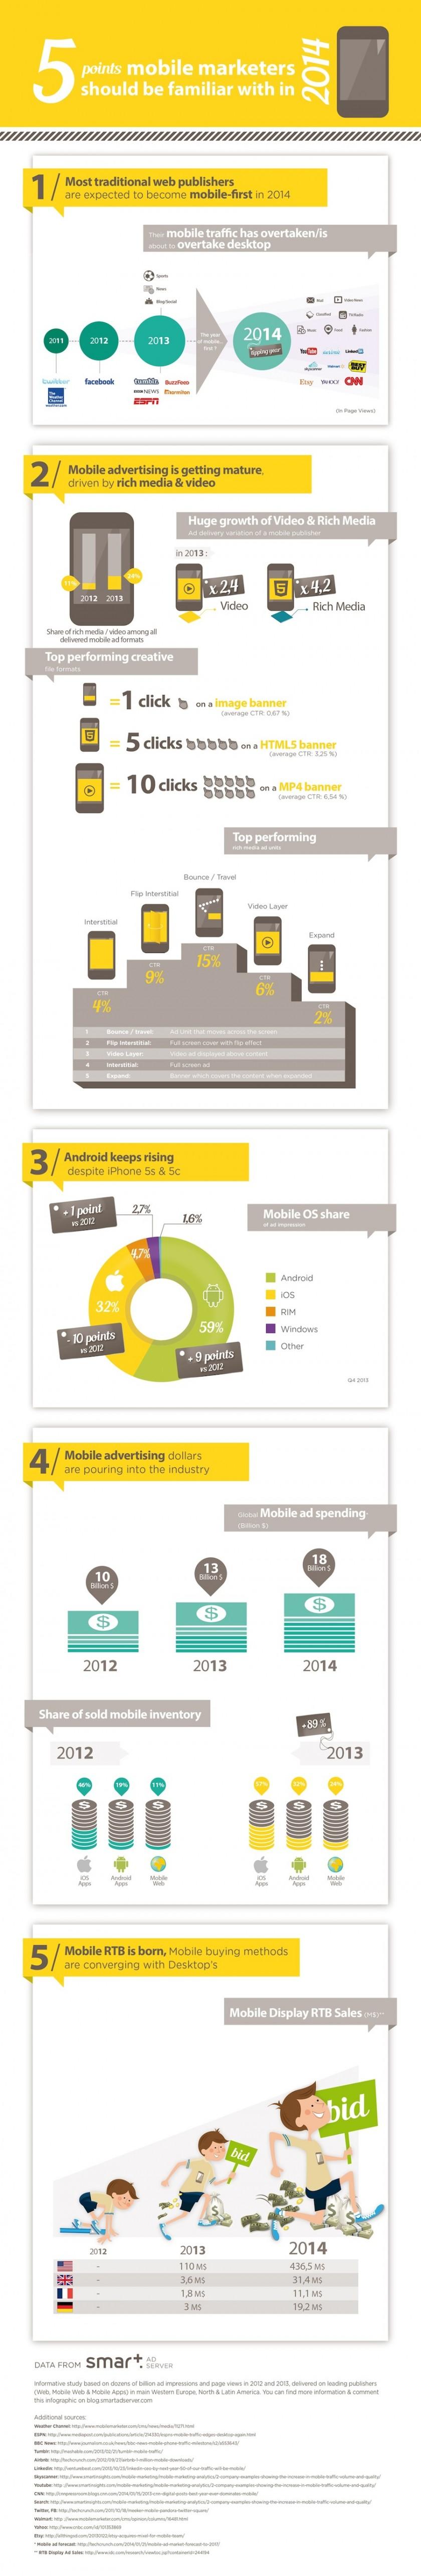 Infographie tendances marketing mobile 2014